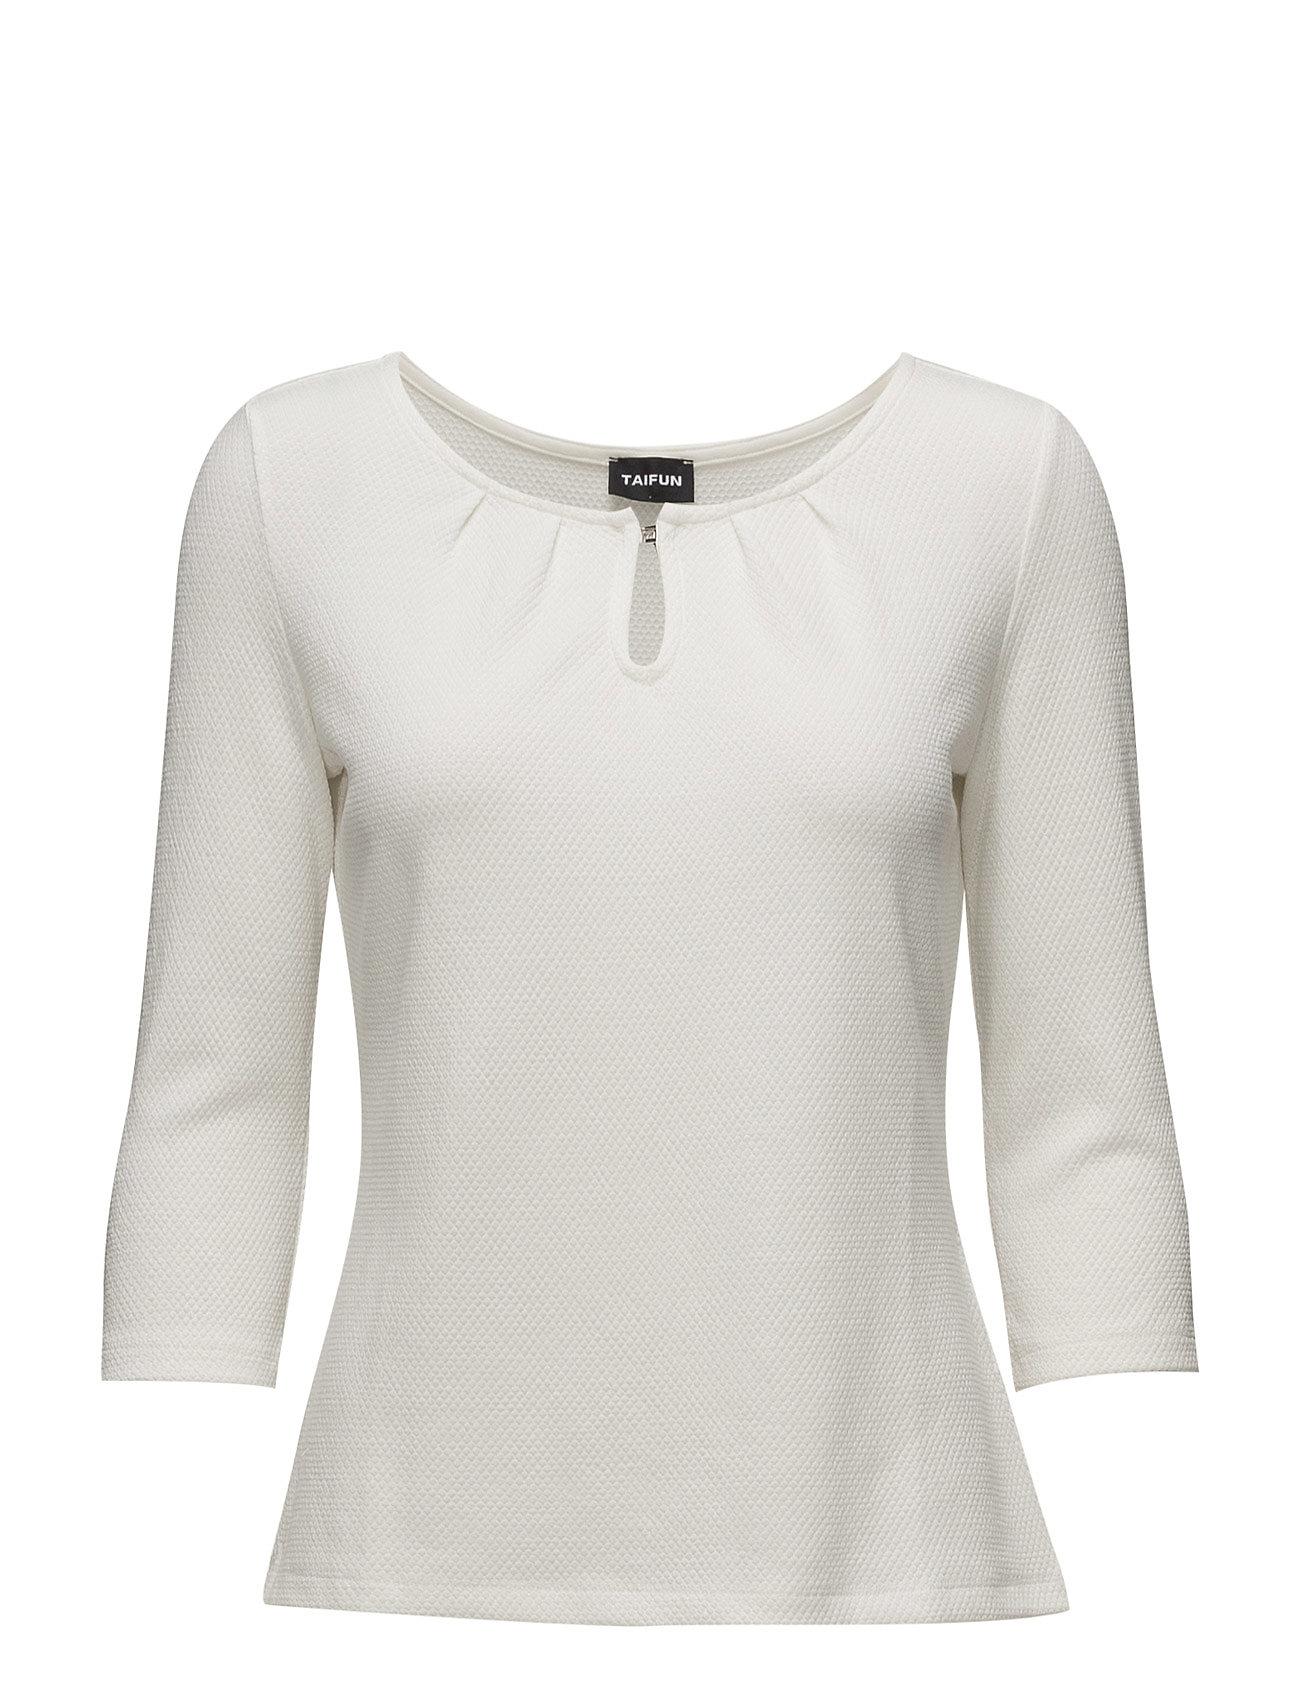 taifun – T-shirt 3/4-sleeve r på boozt.com dk